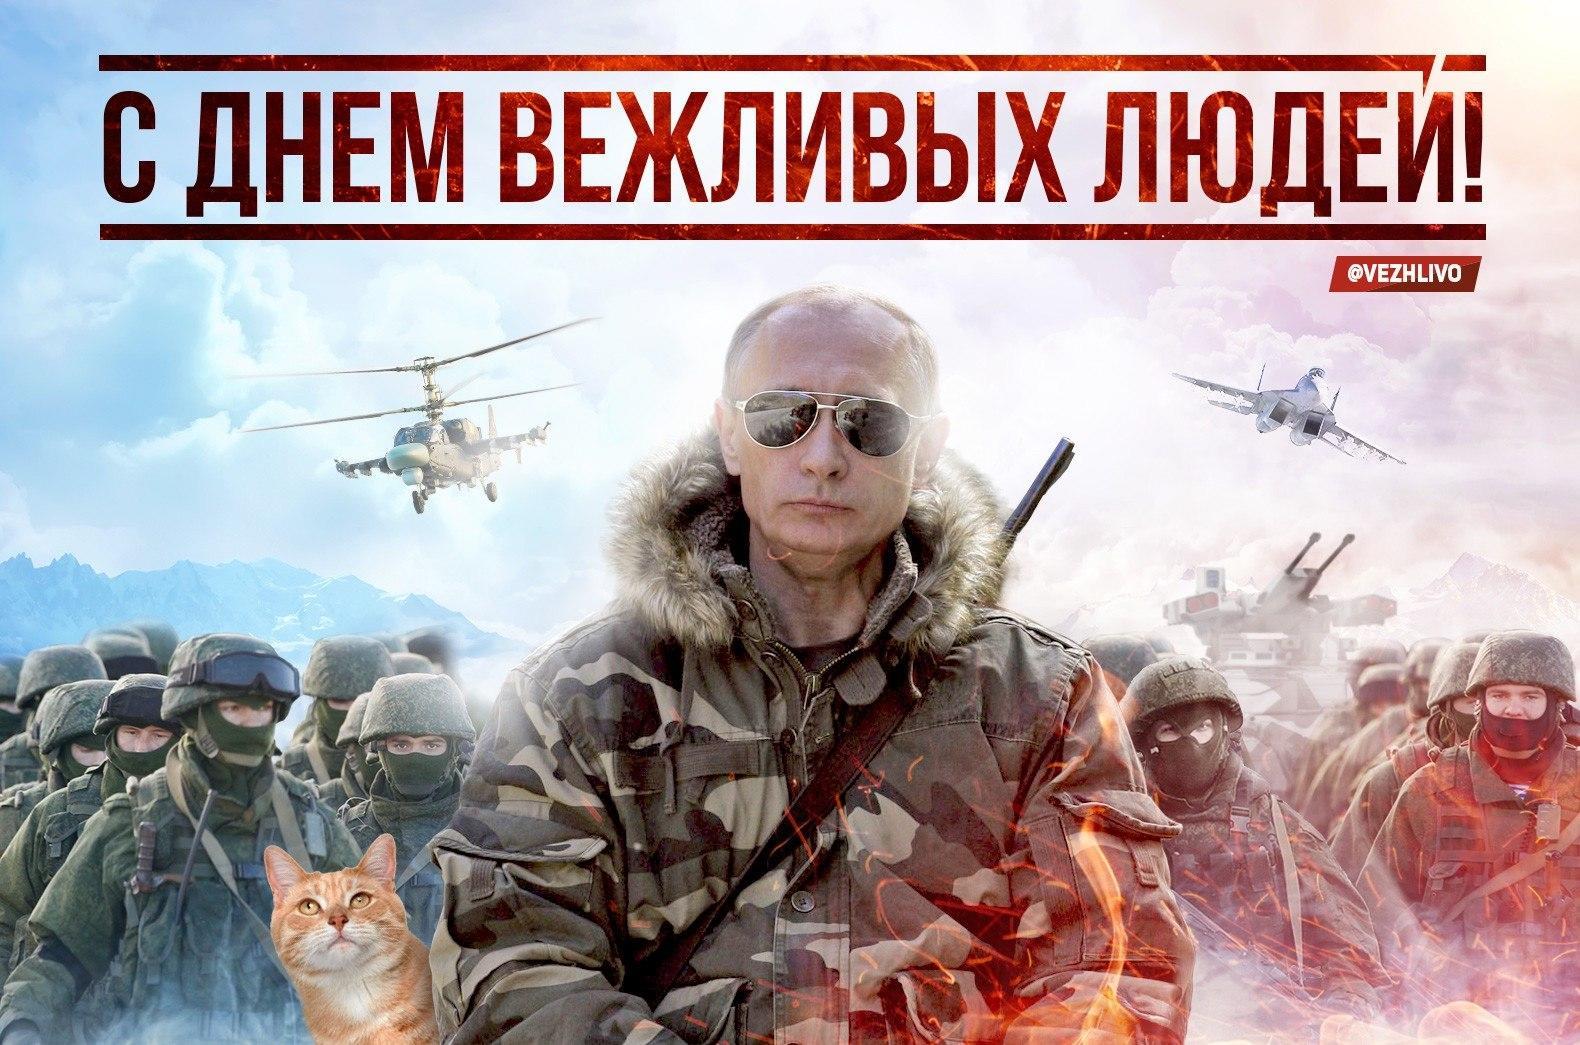 Политика Путина: Безопасное государство, благодаря Вежливым людям...